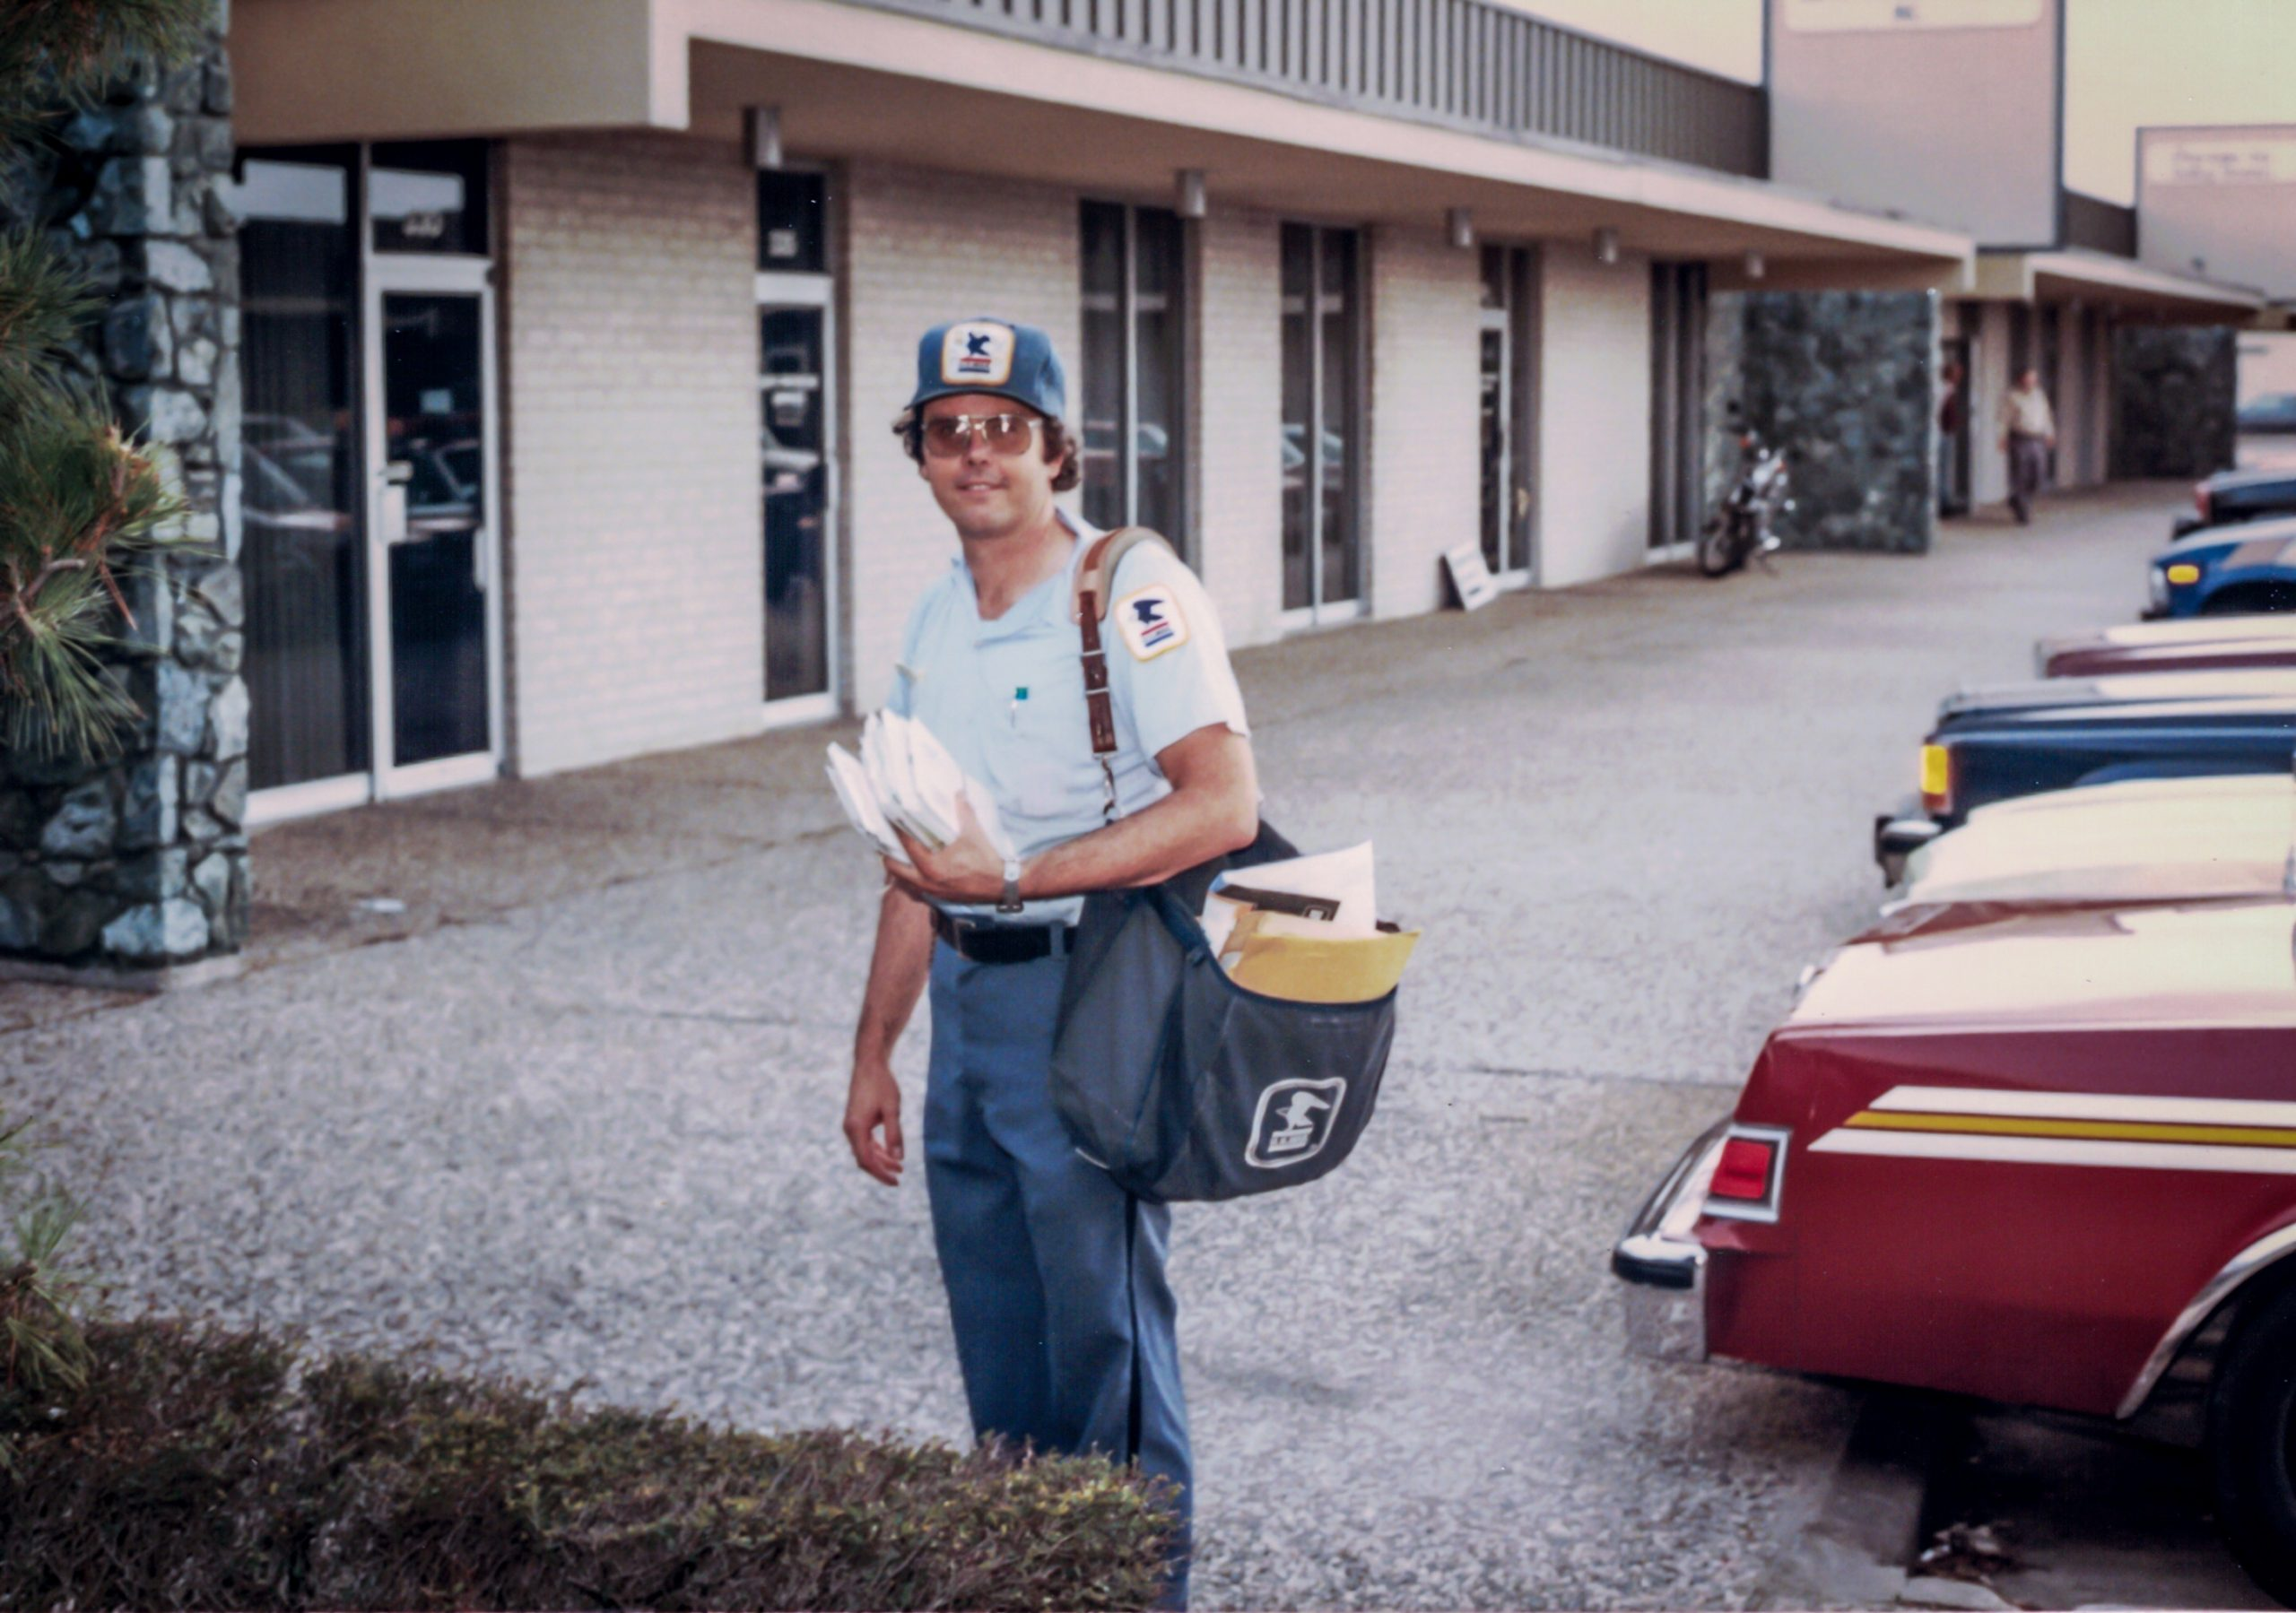 1984 Jim White - Postman.jpg